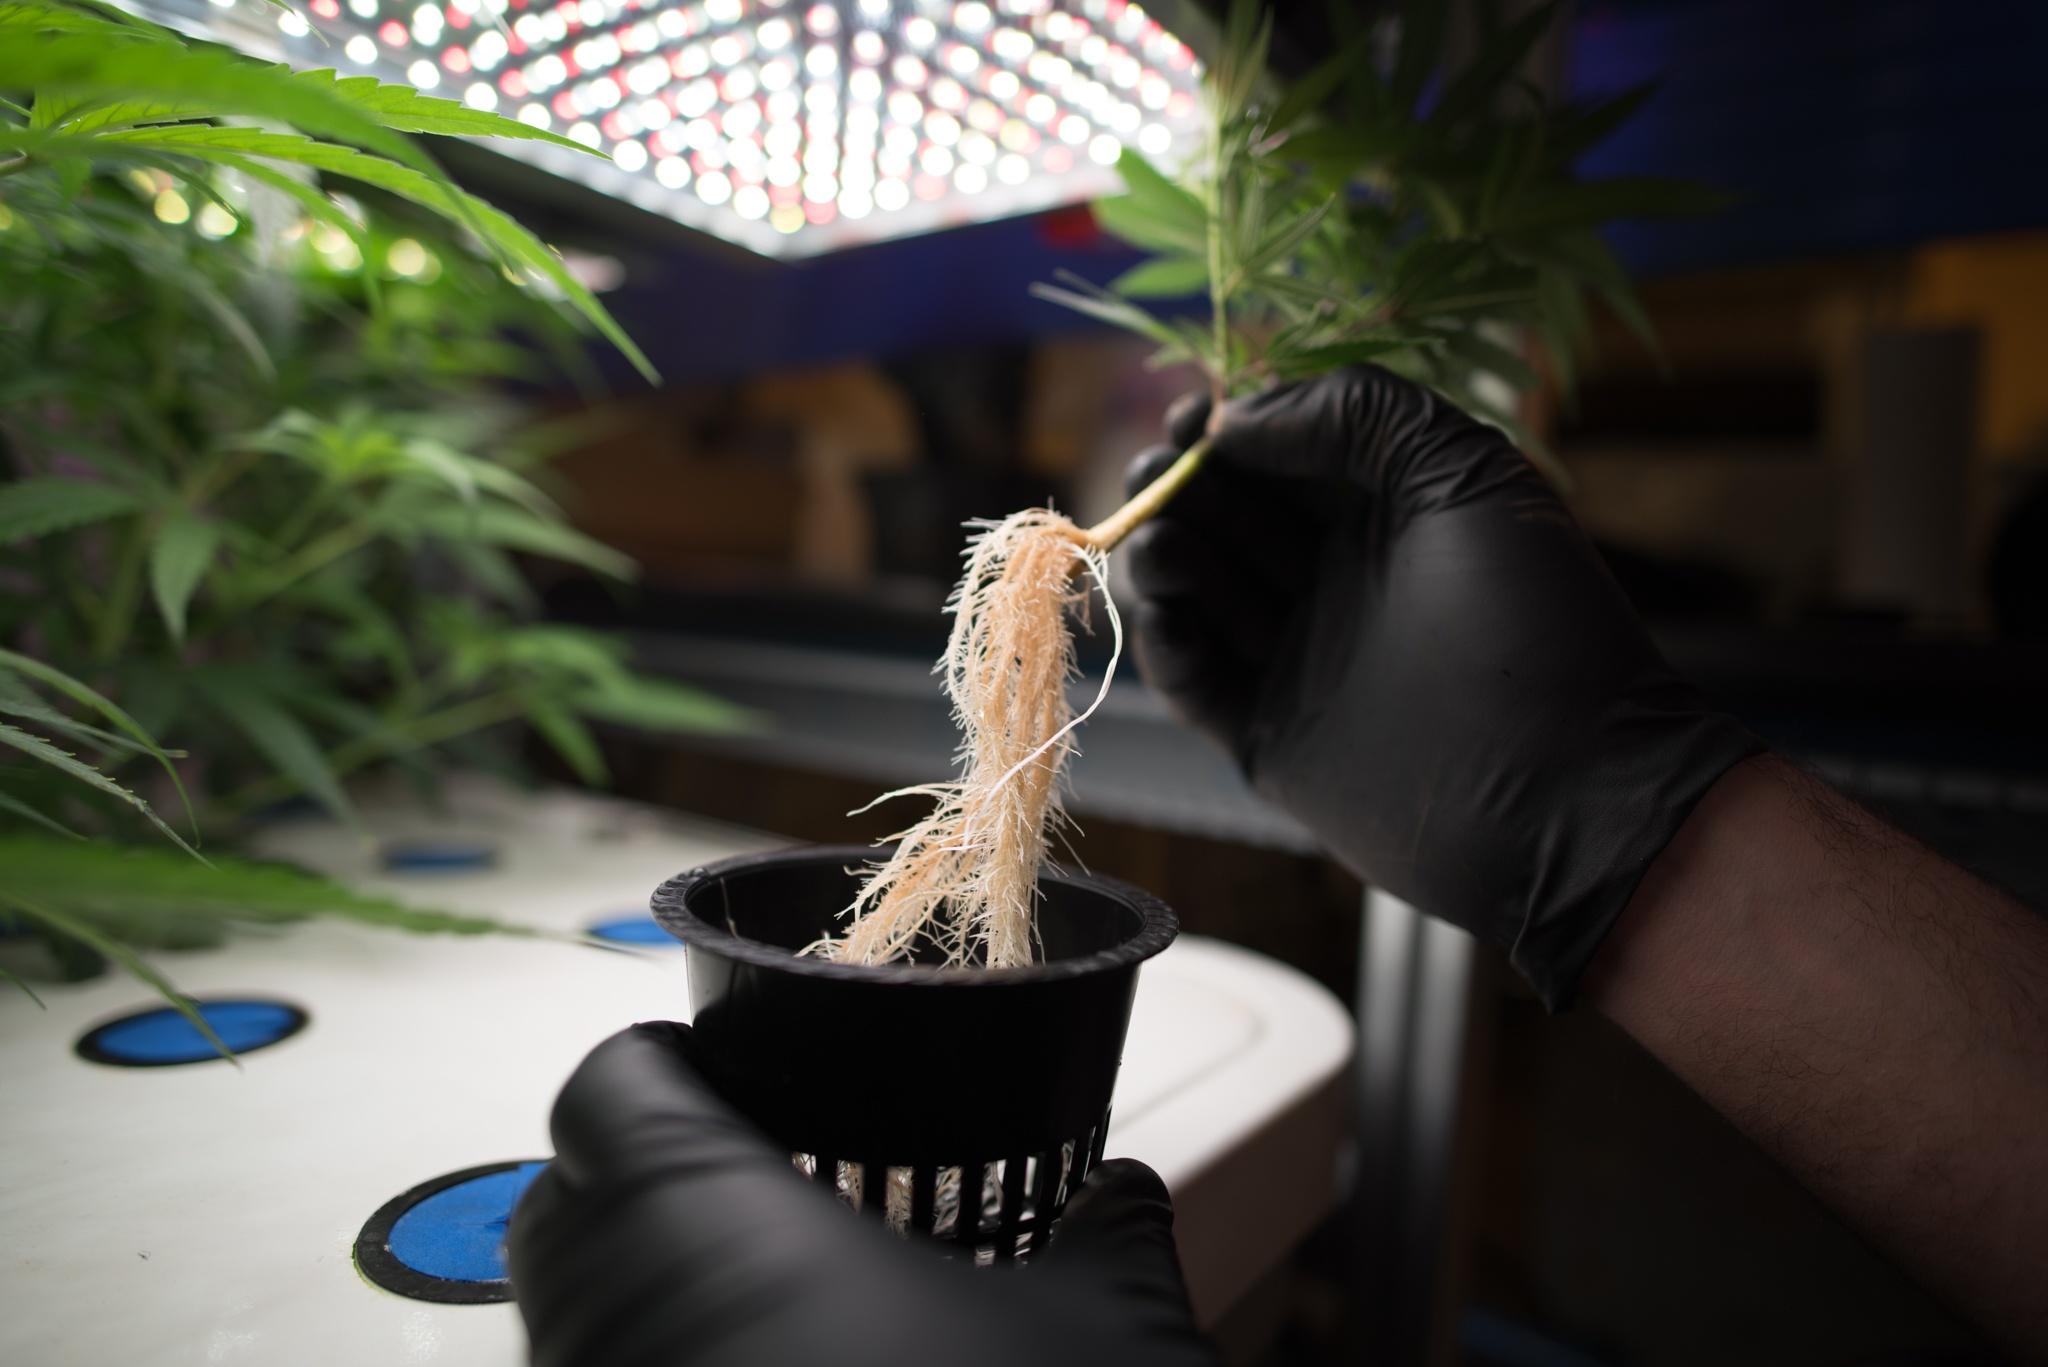 AEtrium-2 Cultivation Cloning Transfer